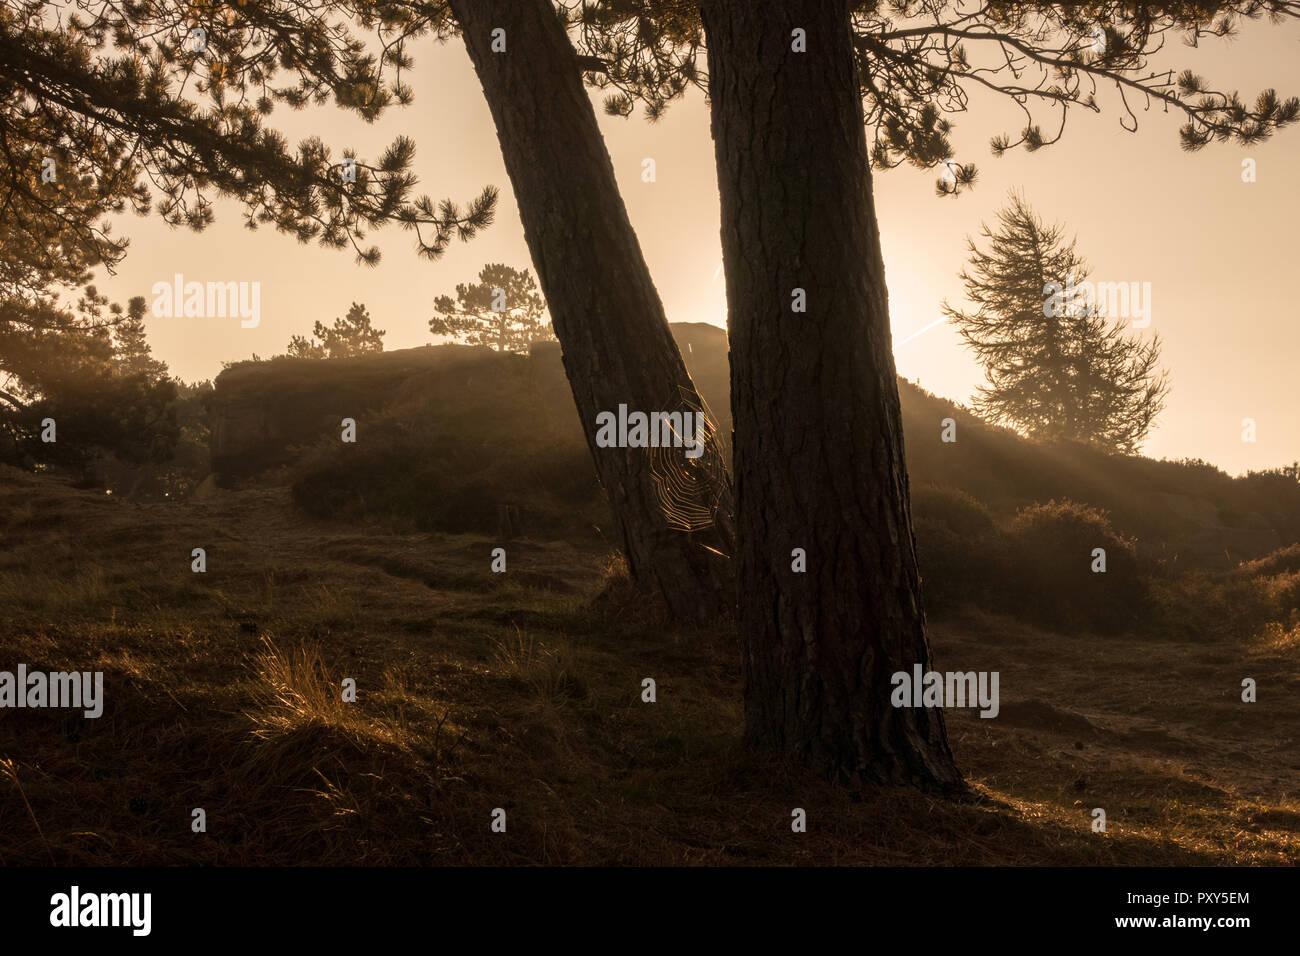 Between Trees Stock Photos Amp Between Trees Stock Images